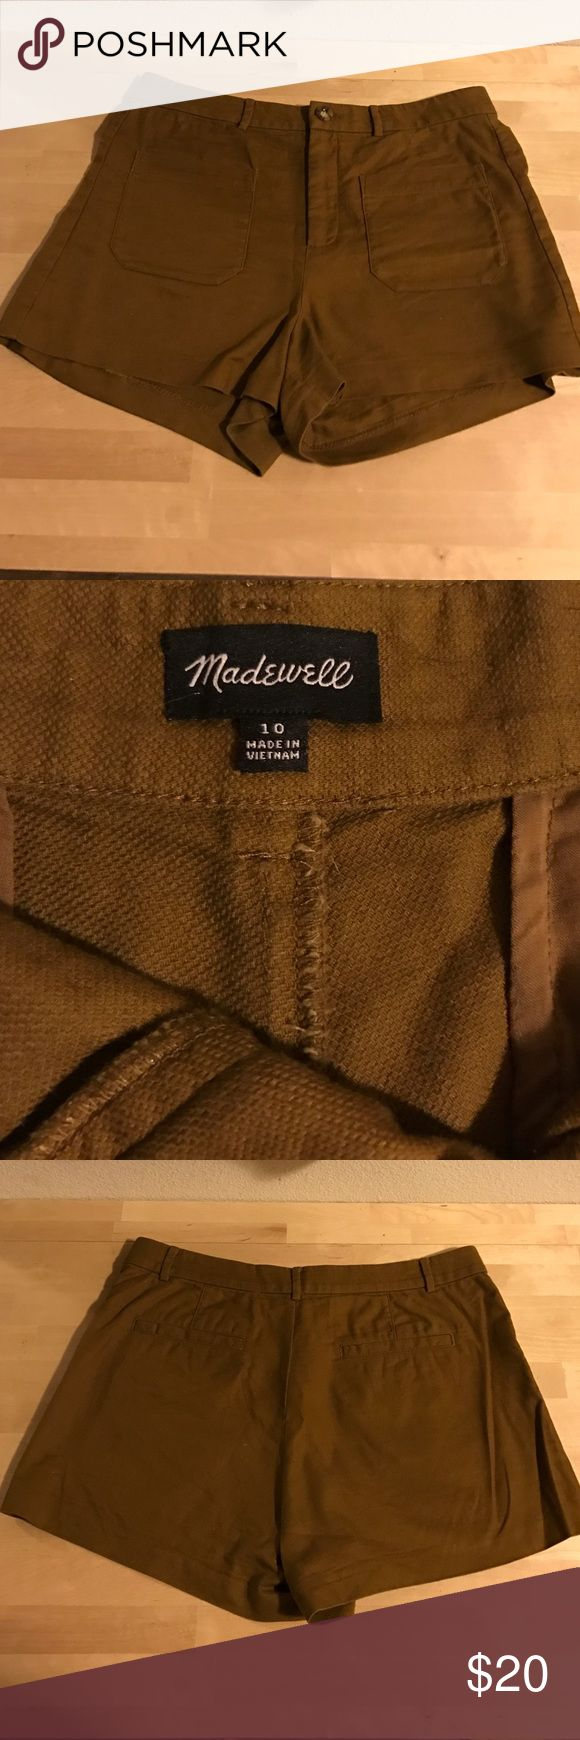 Madewell Brown Linen Shorts Madewell High-rise Brown Shorts. Size 10.  82% cotton. 18% Linen Madewell Shorts